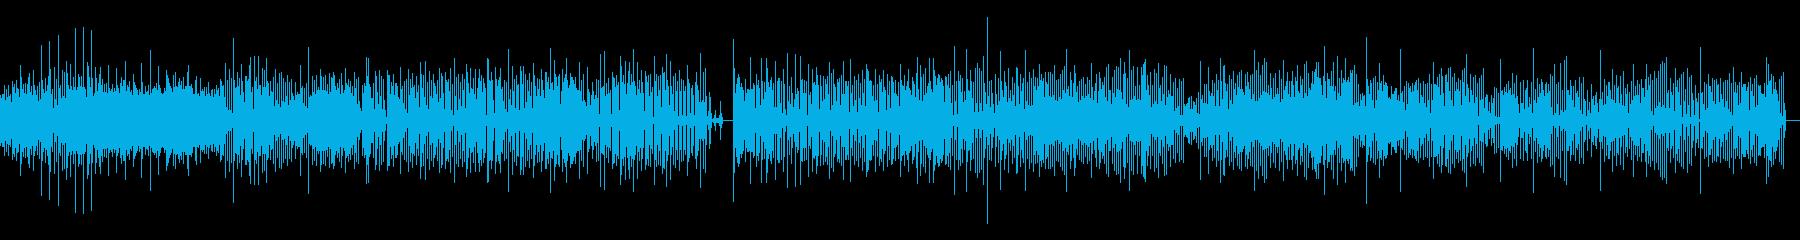 TV DiYは、簡単に編集できるよ...の再生済みの波形